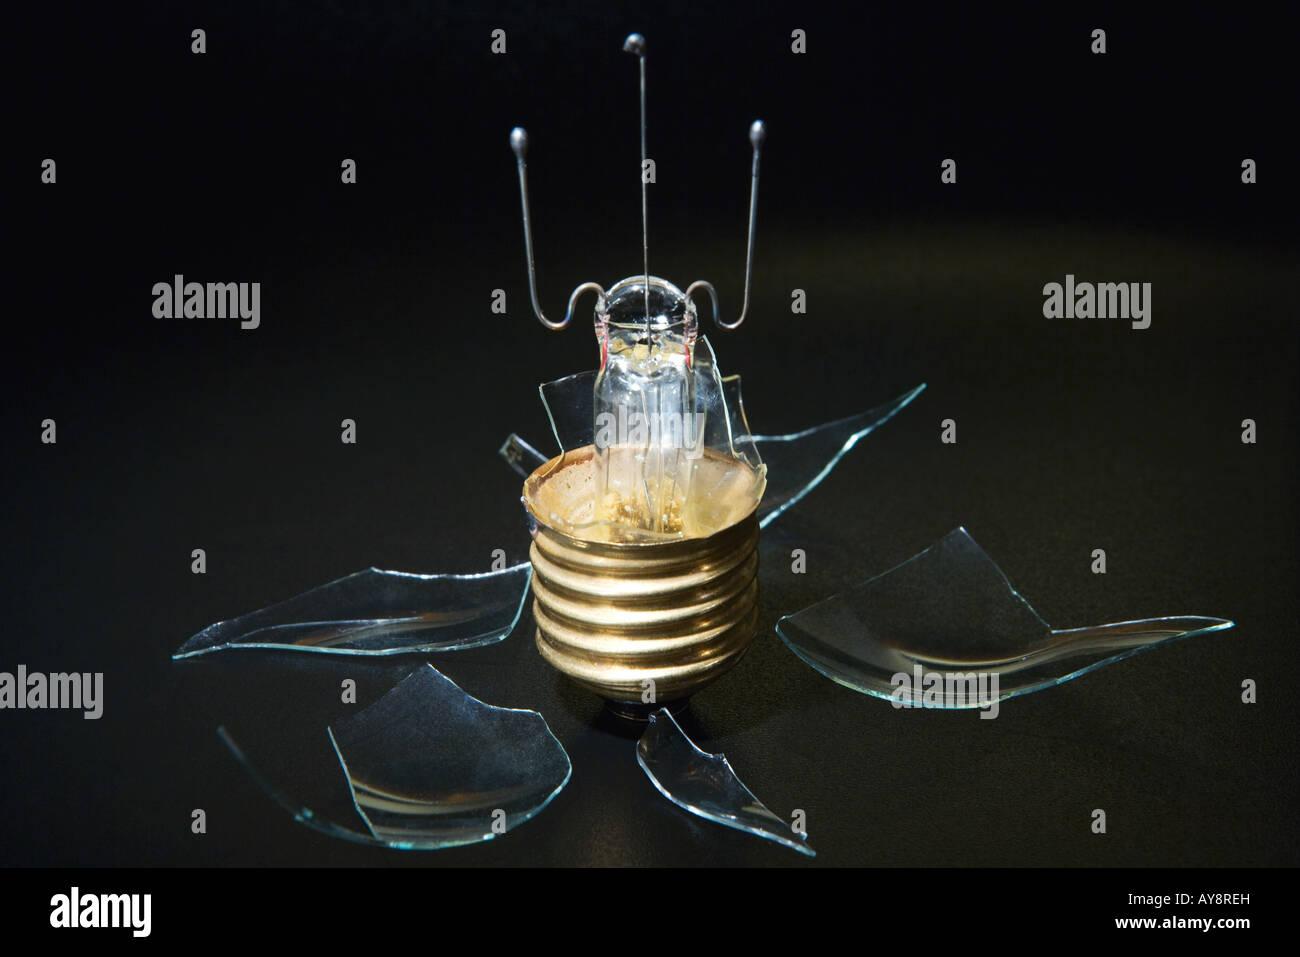 Broken light bulb, close-up - Stock Image